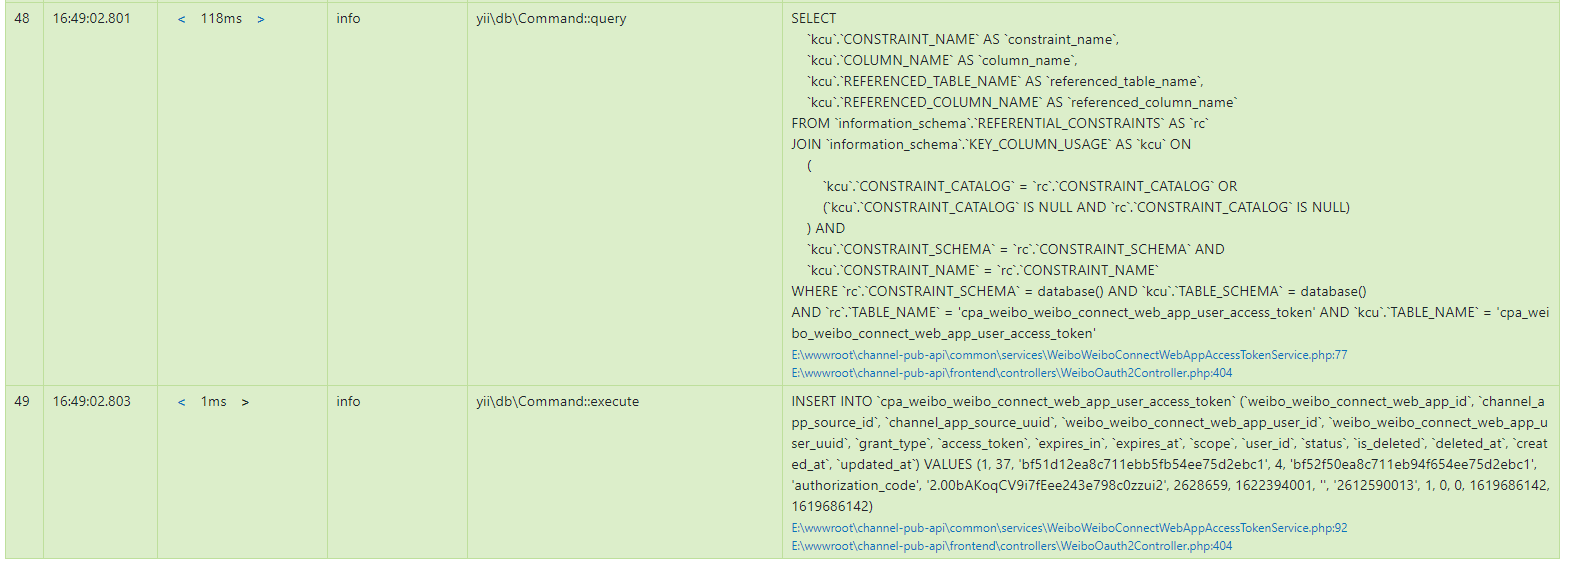 查看 Log Messages,在 E:\wwwroot\channel-pub-api\common\services\WeiboWeiboConnectWebAppAccessTokenService.php:92 处就停止往下执行了,实则应该继续执行才是。